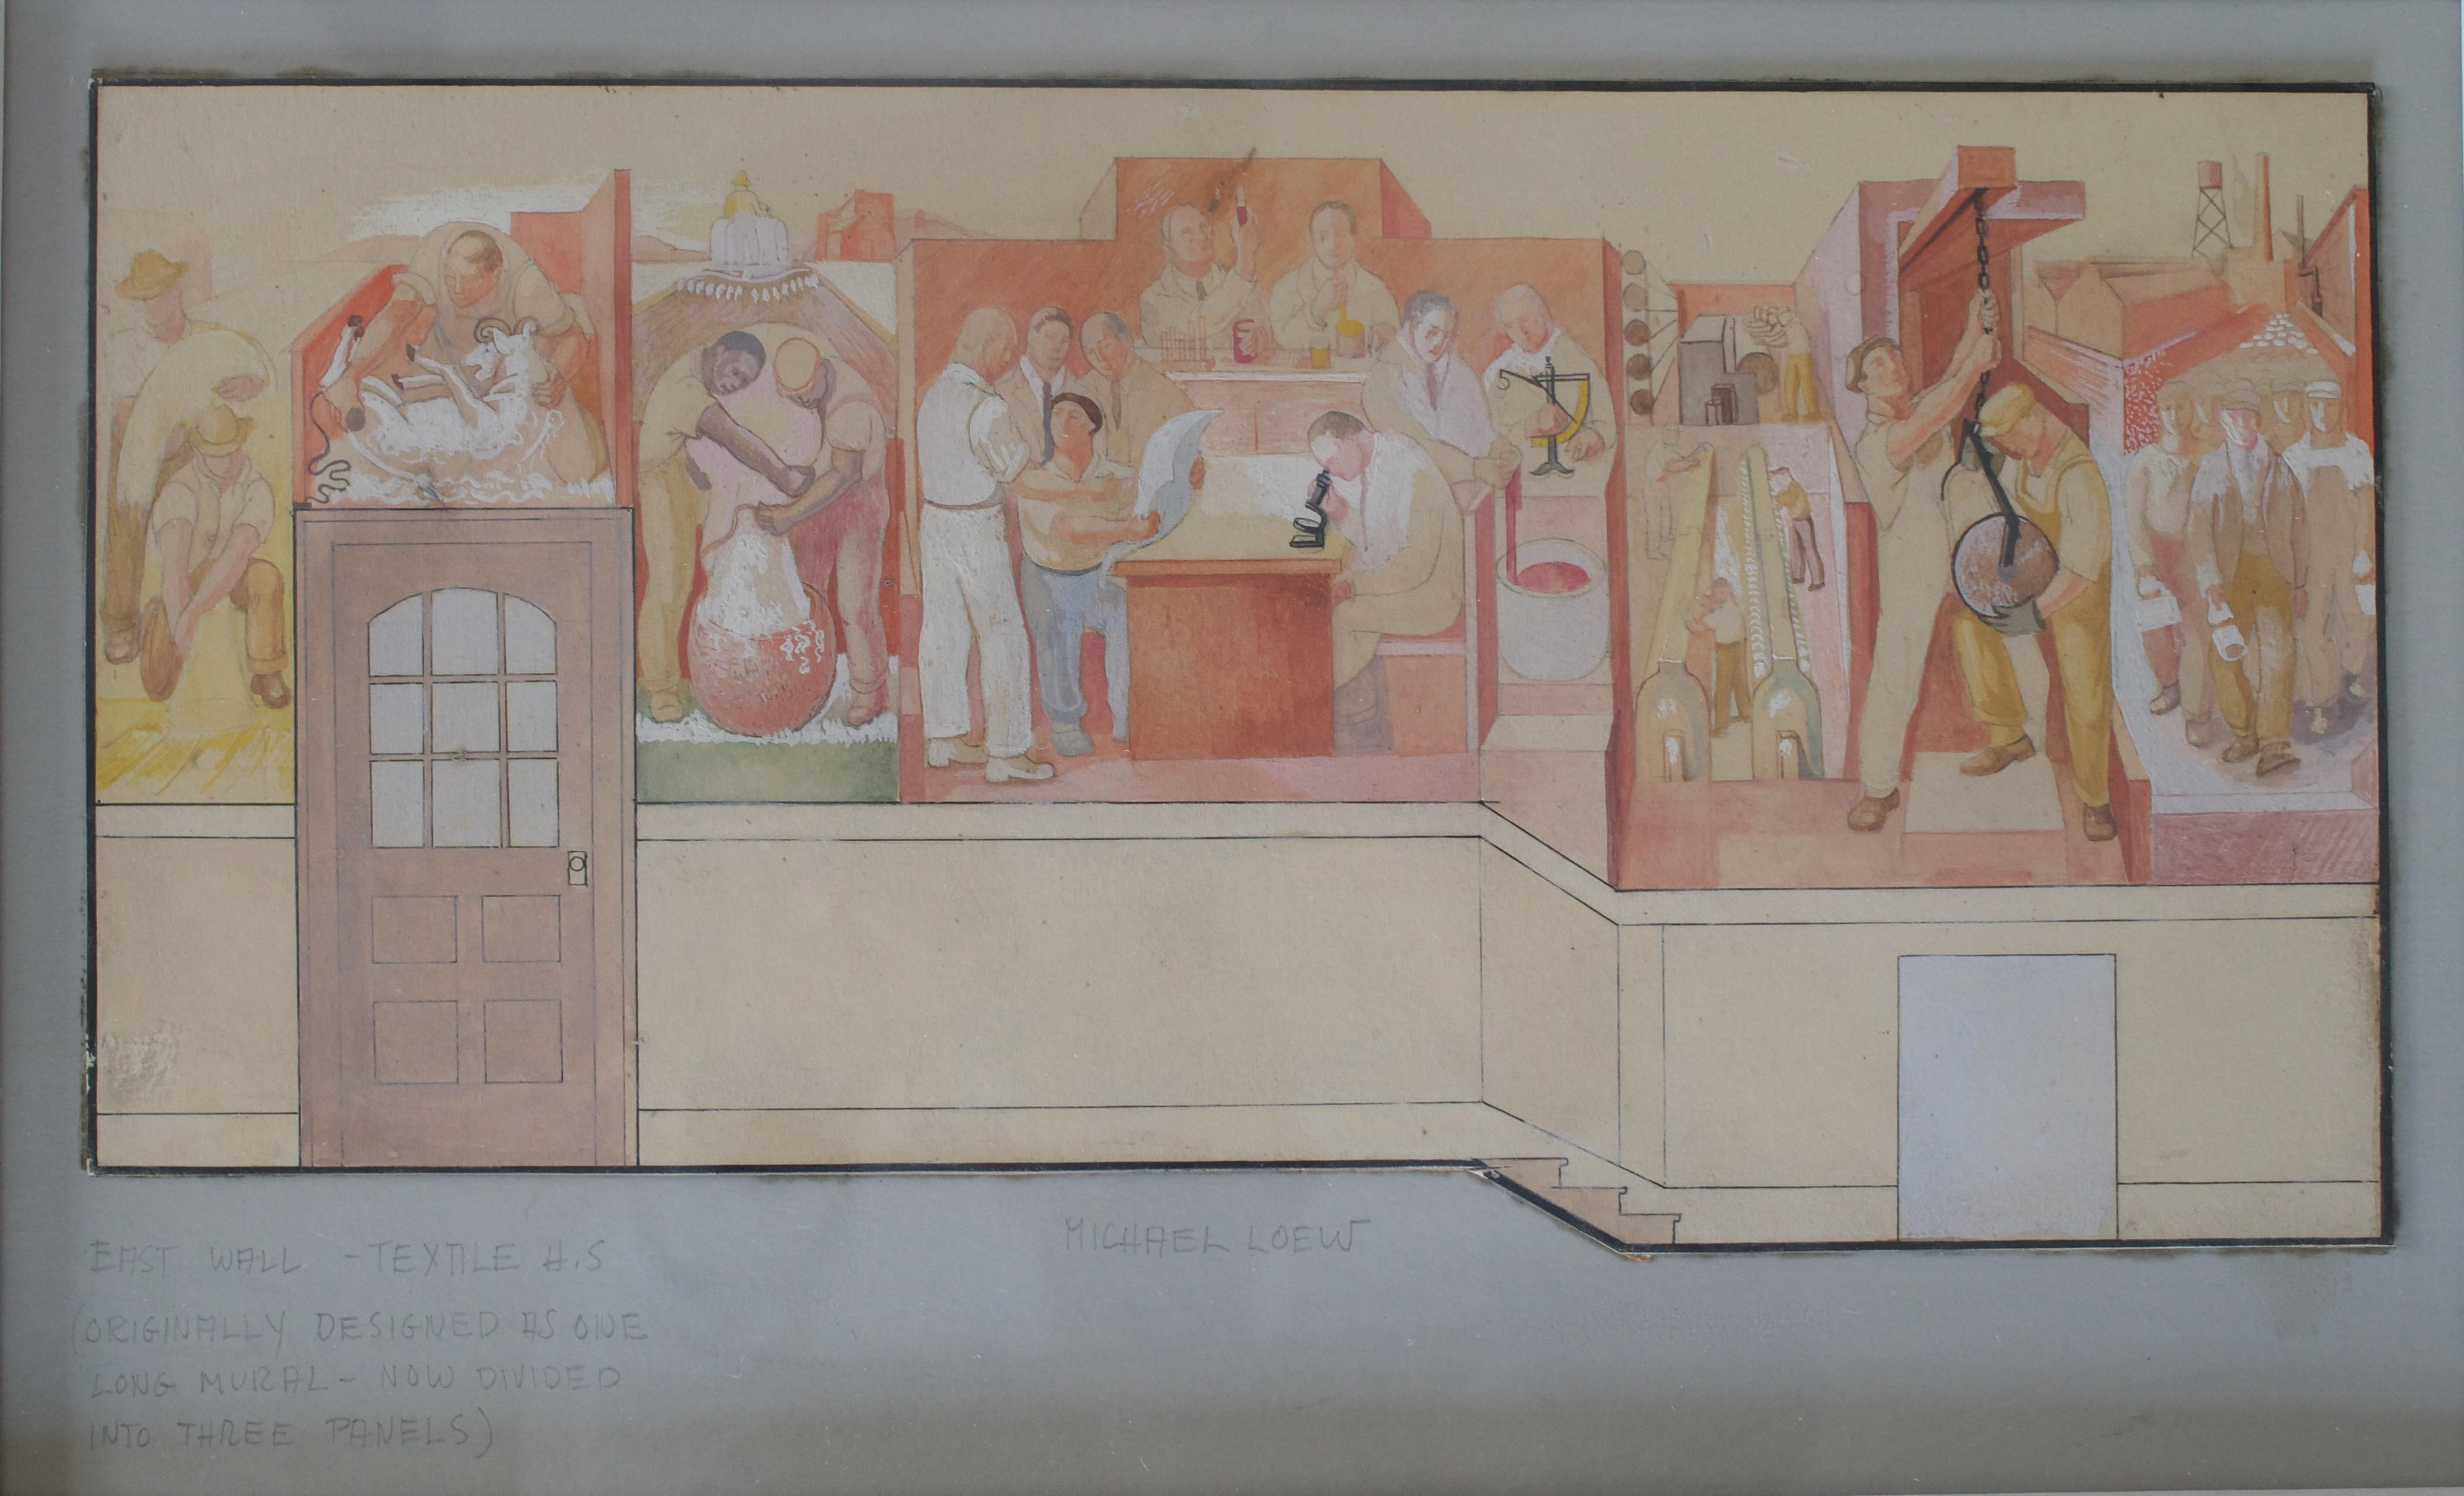 Mural Study 1933 Depression Era Mid-Century WPA Modern American Scene Drawing